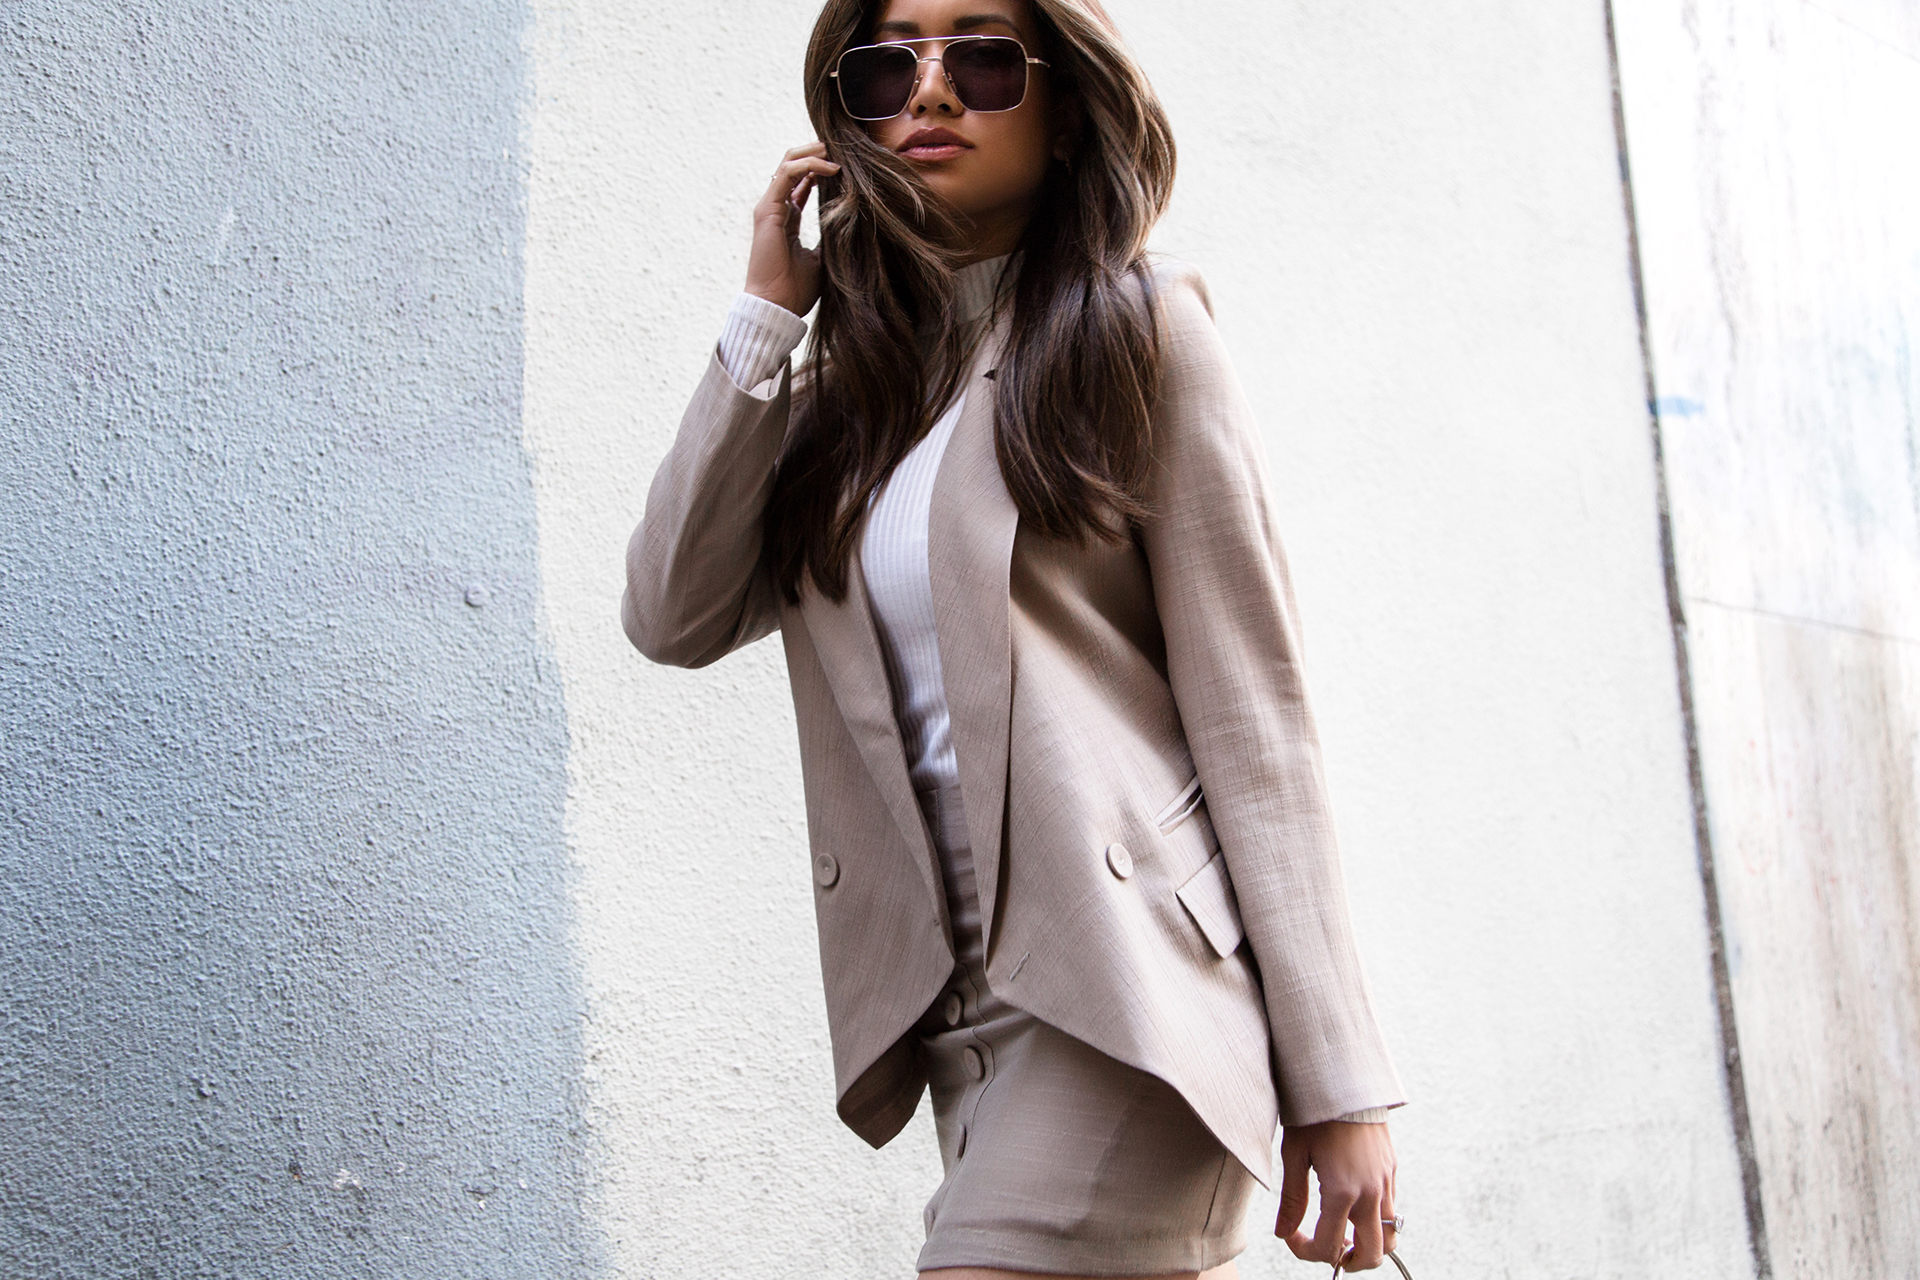 Jessi Malay wearing Misha Vaidya Skirt and Blazer Set